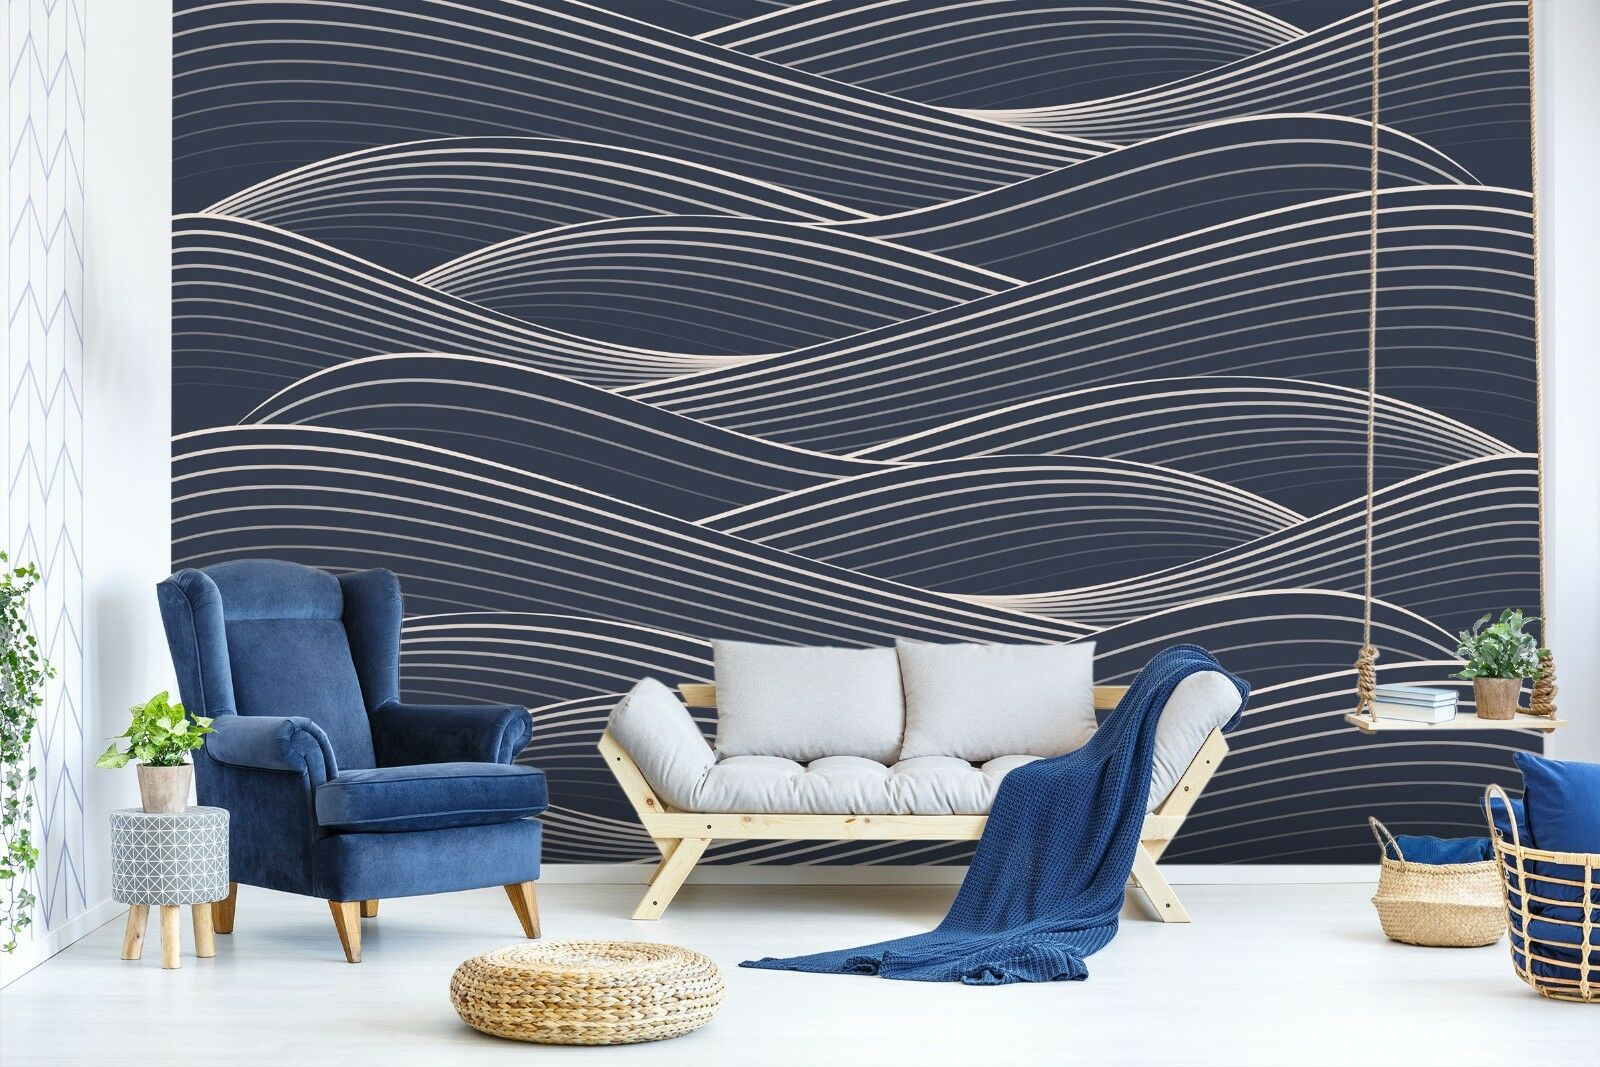 3D Waves Line 7051 Wallpaper Mural Paper Wall Print Indoor Murals CA Summer